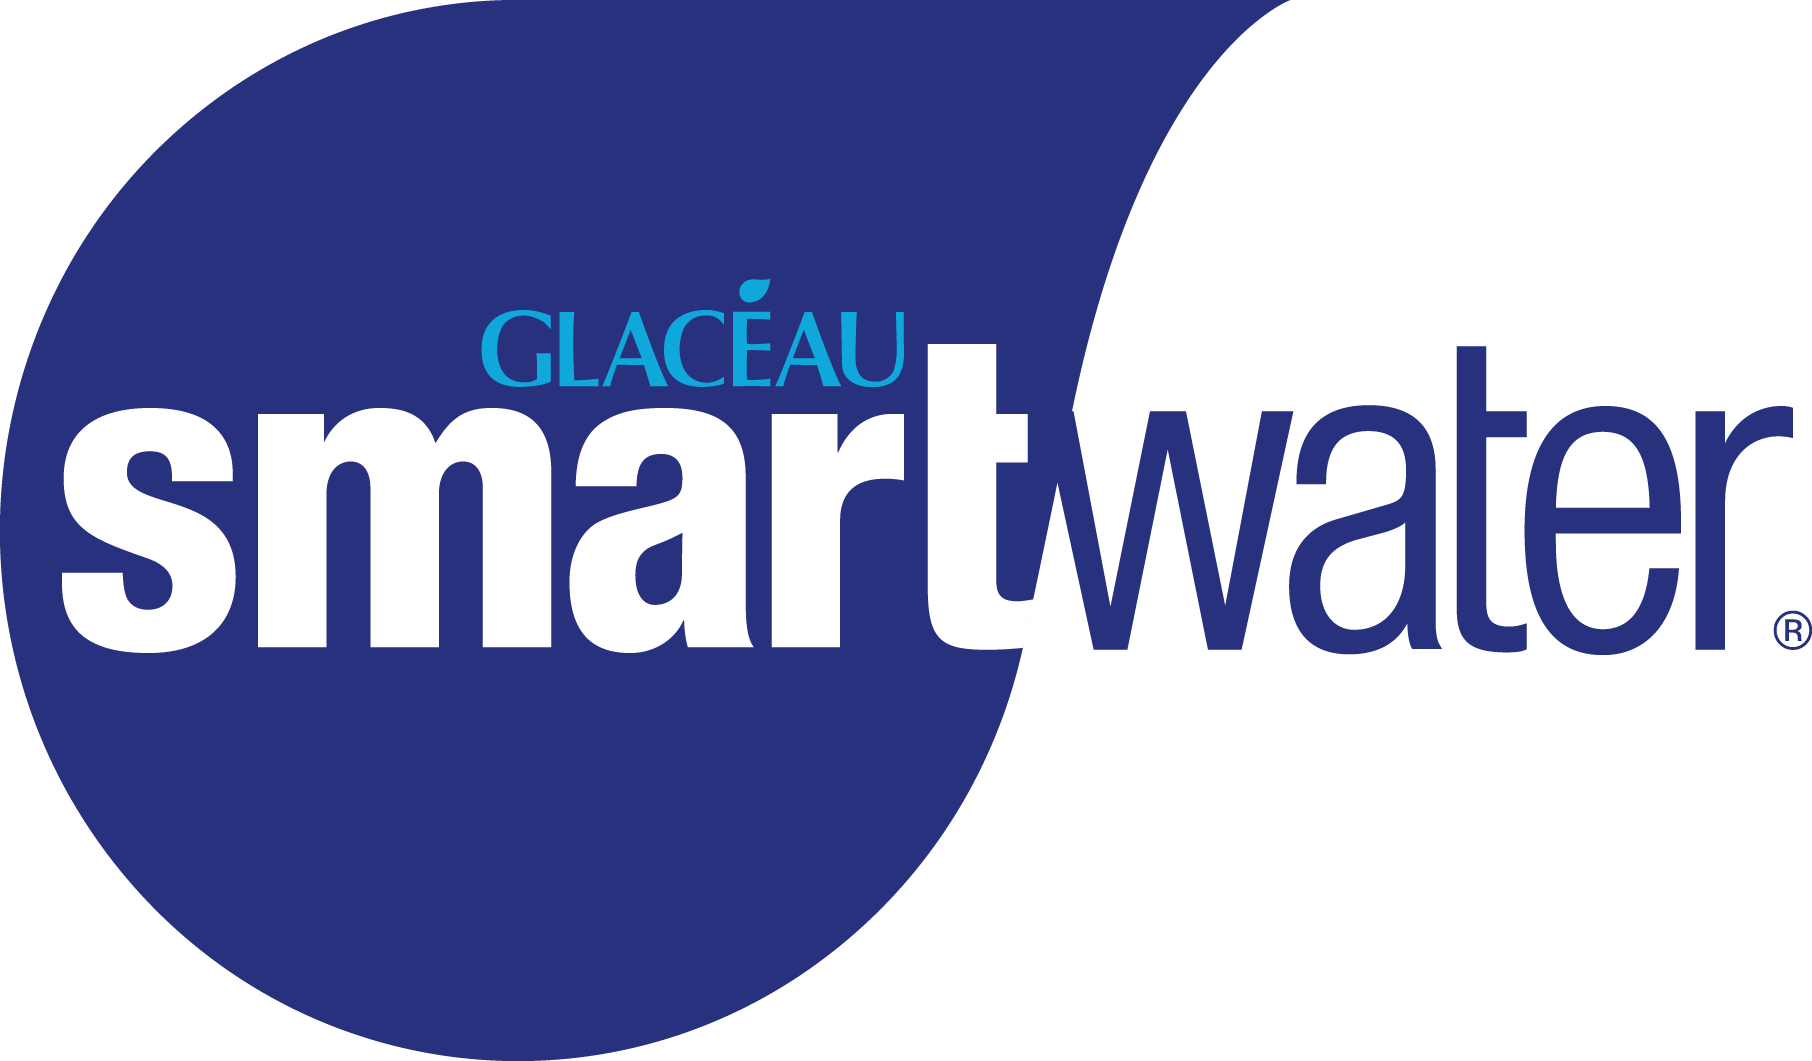 Smartwater drop logo.png